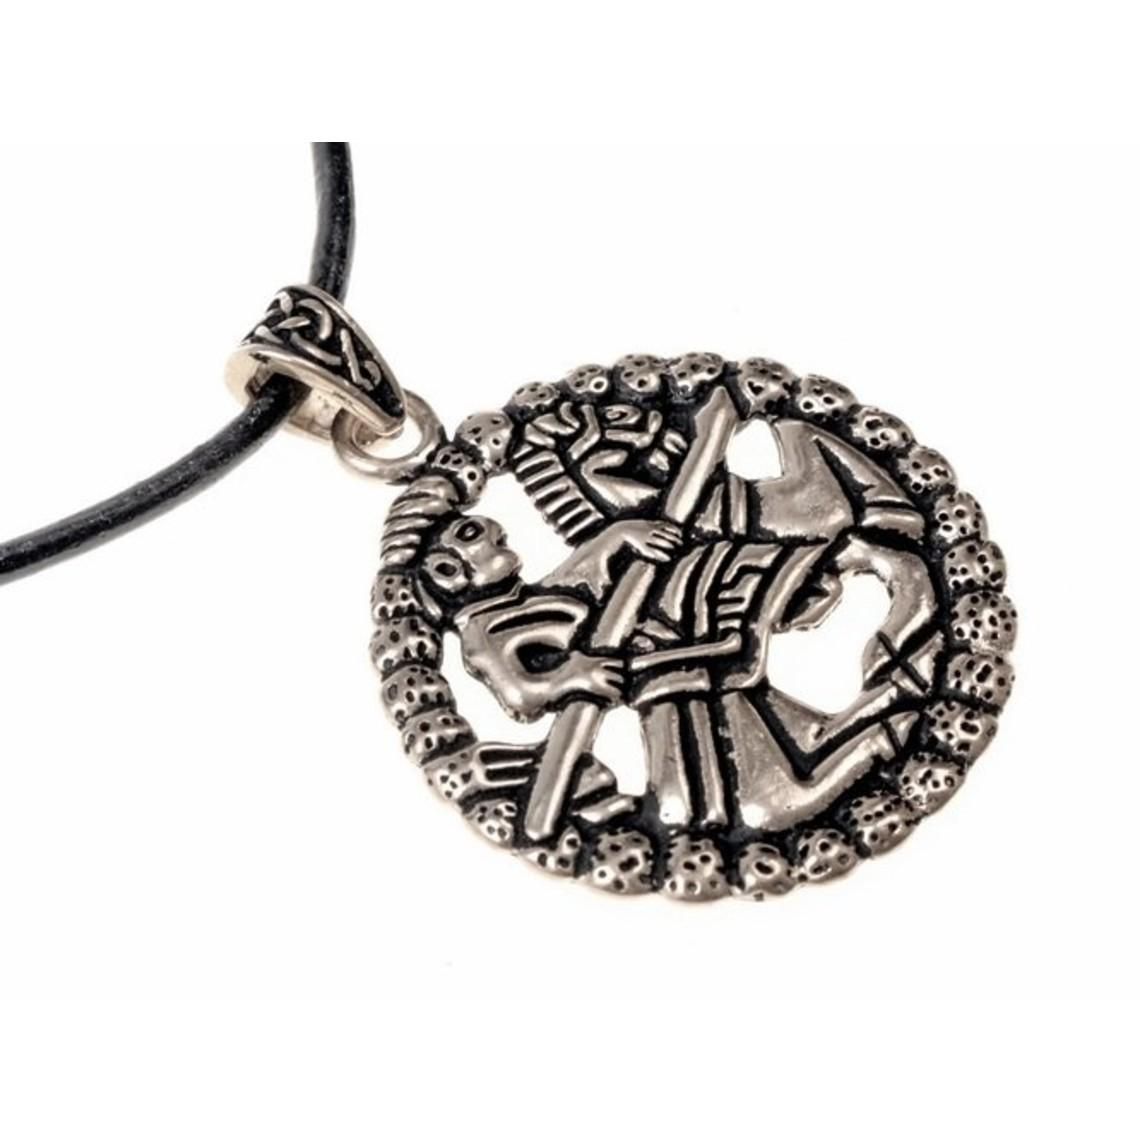 Amulette cavalier Gokstad, argentée